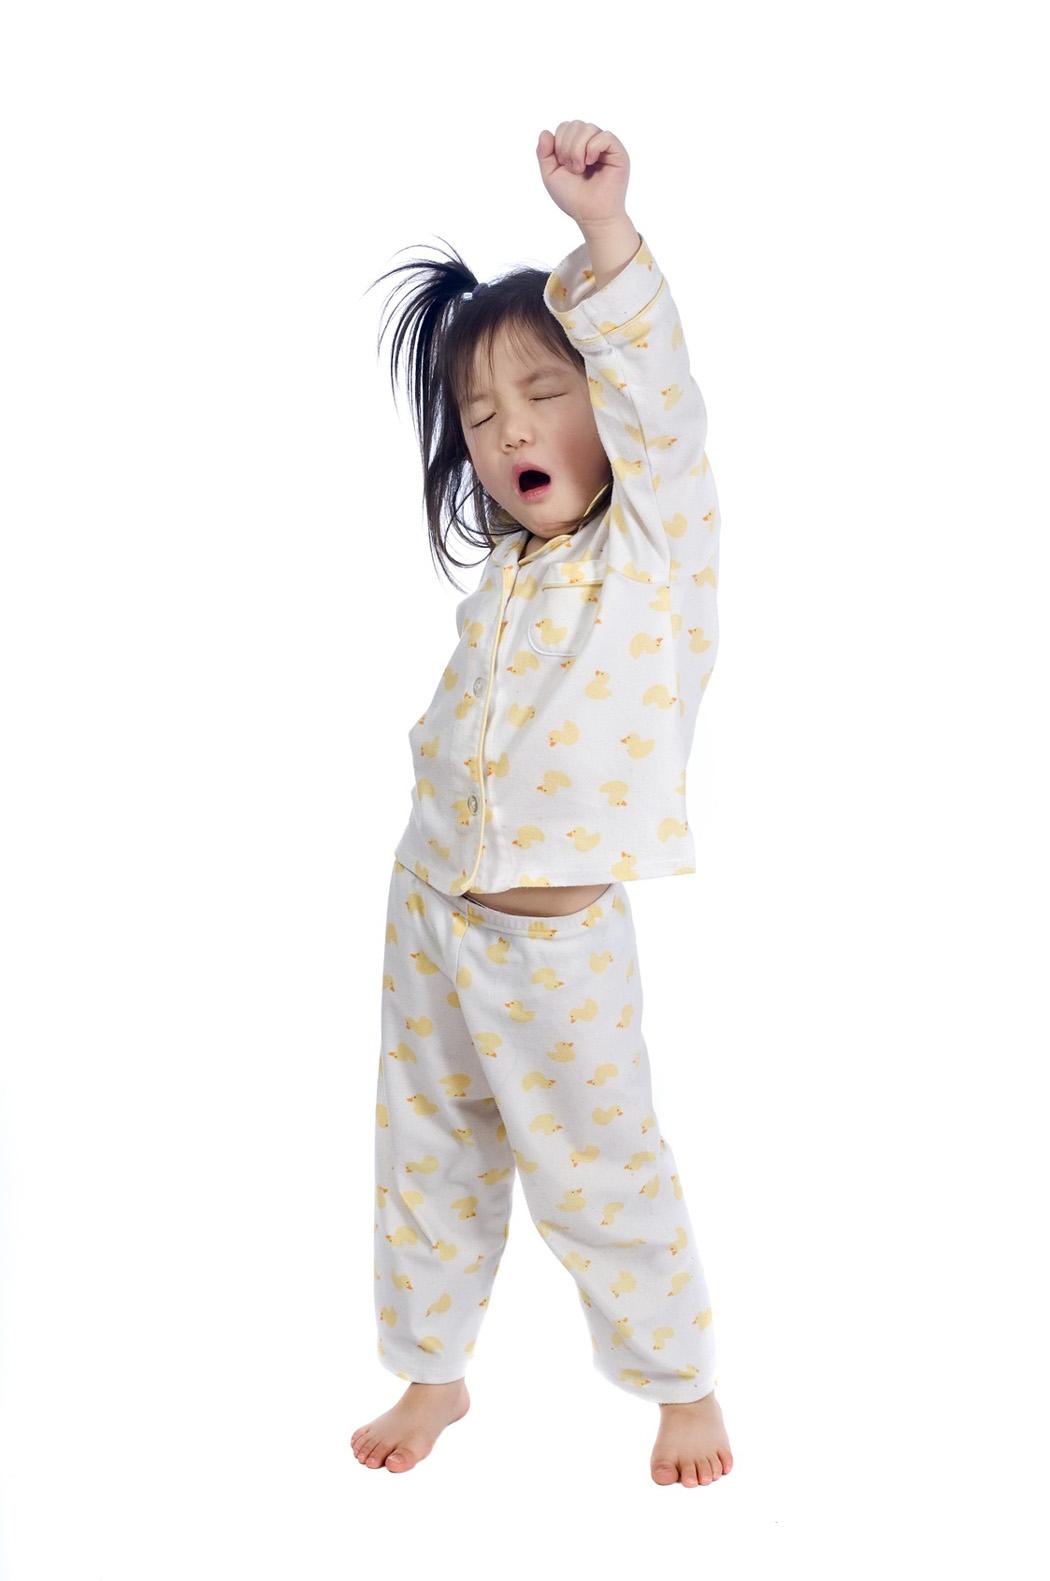 Pajama Day and the Simple Pleasure of a Good Night's Sleep ...